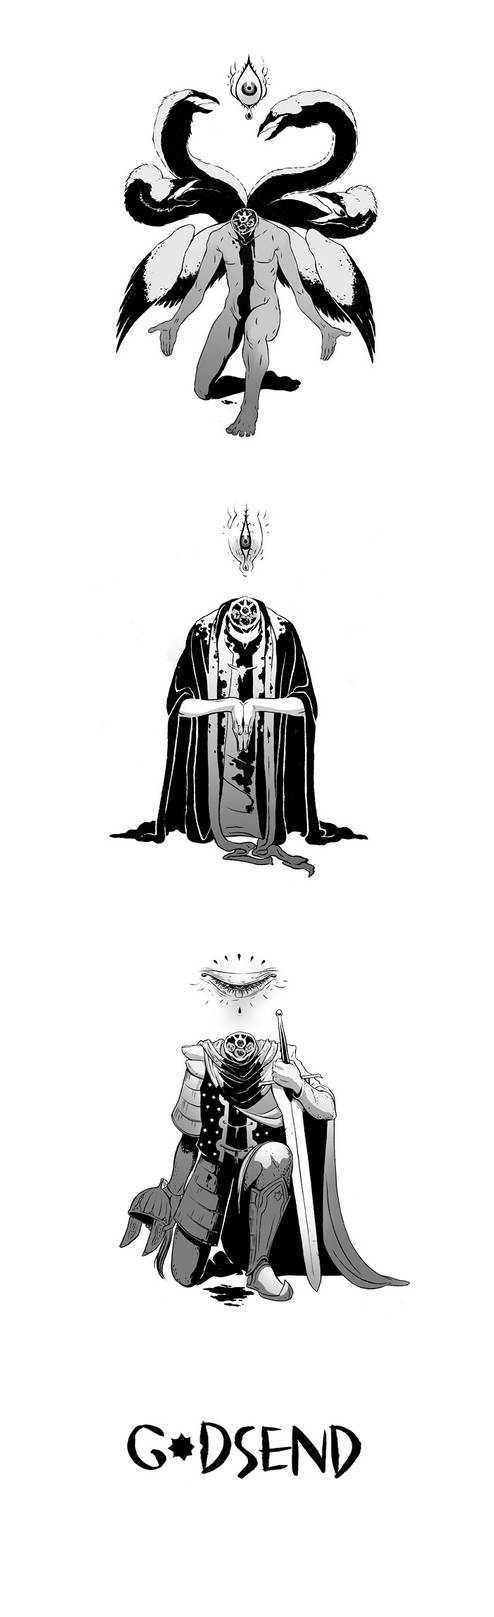 GODSEND KICKSTARTER by megrar